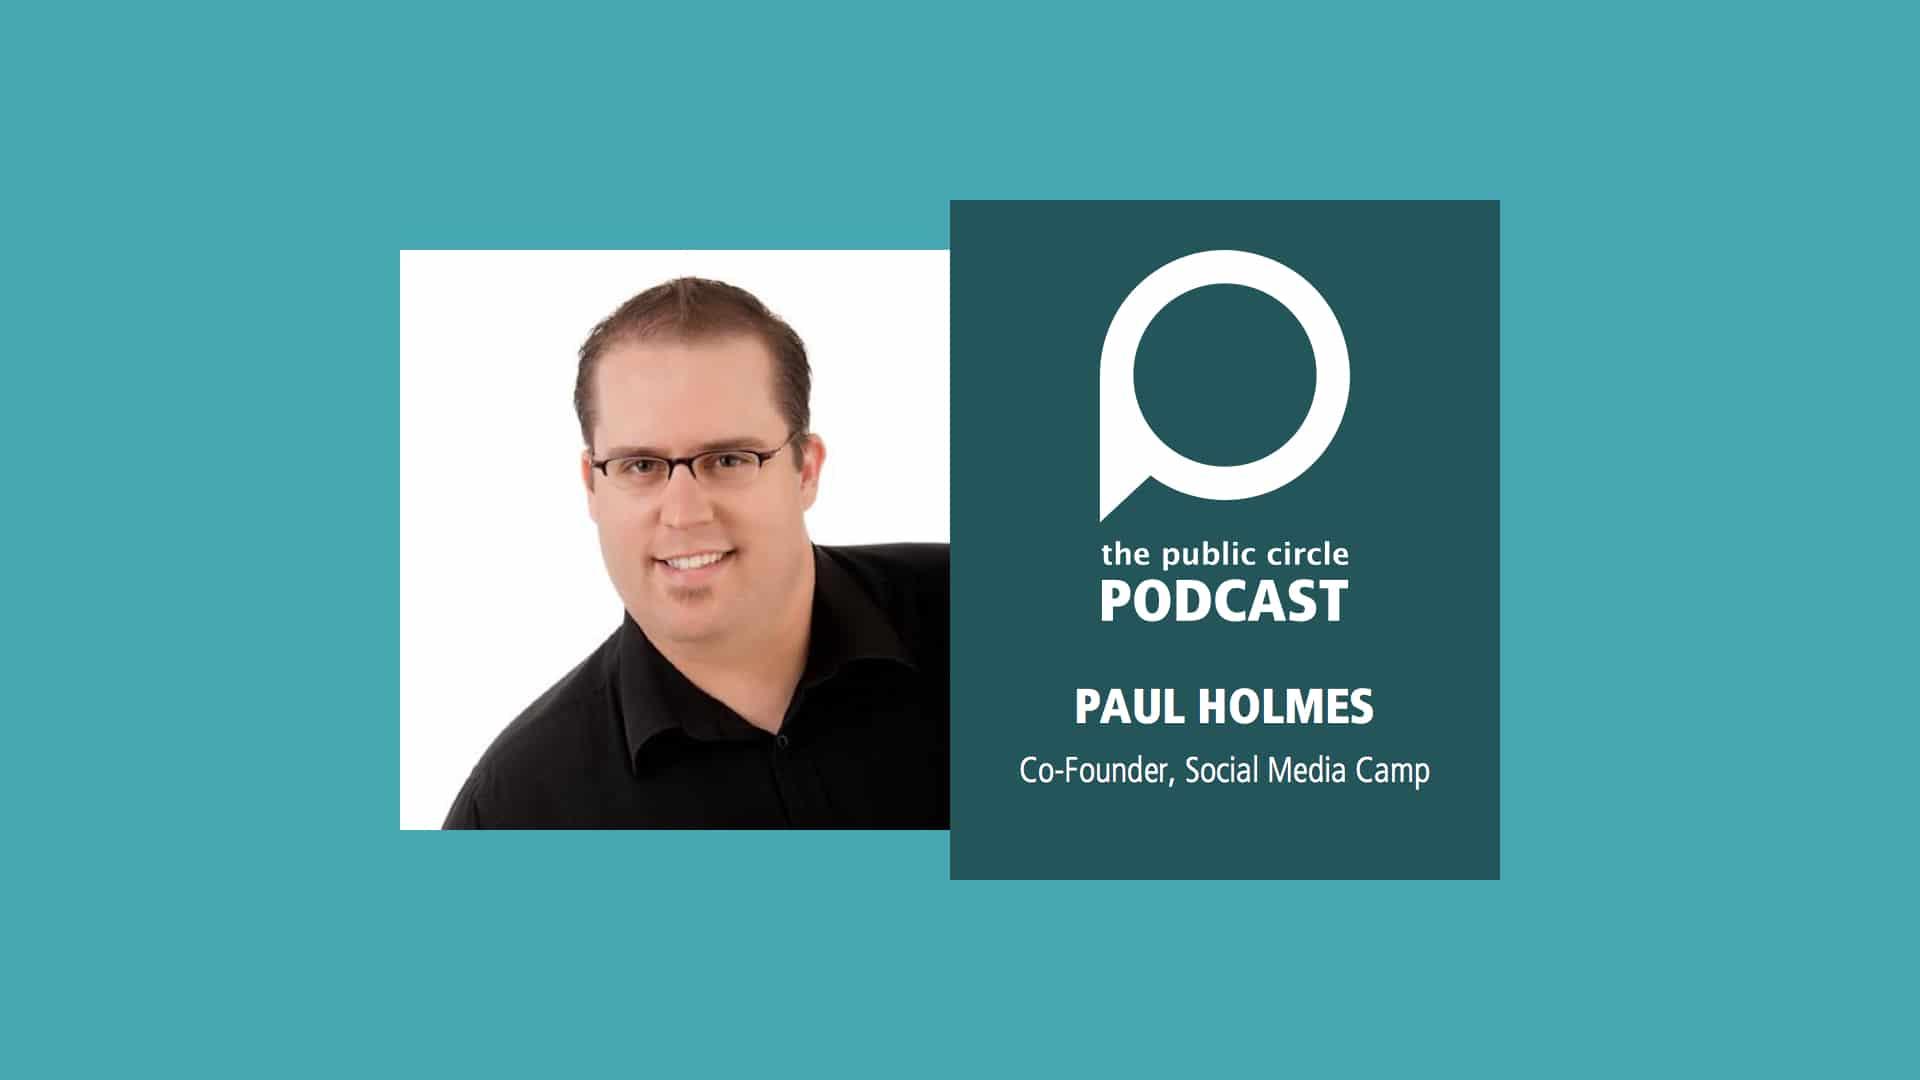 PODCAST: Paul Holmes, Co-Founder – Social Media Camp